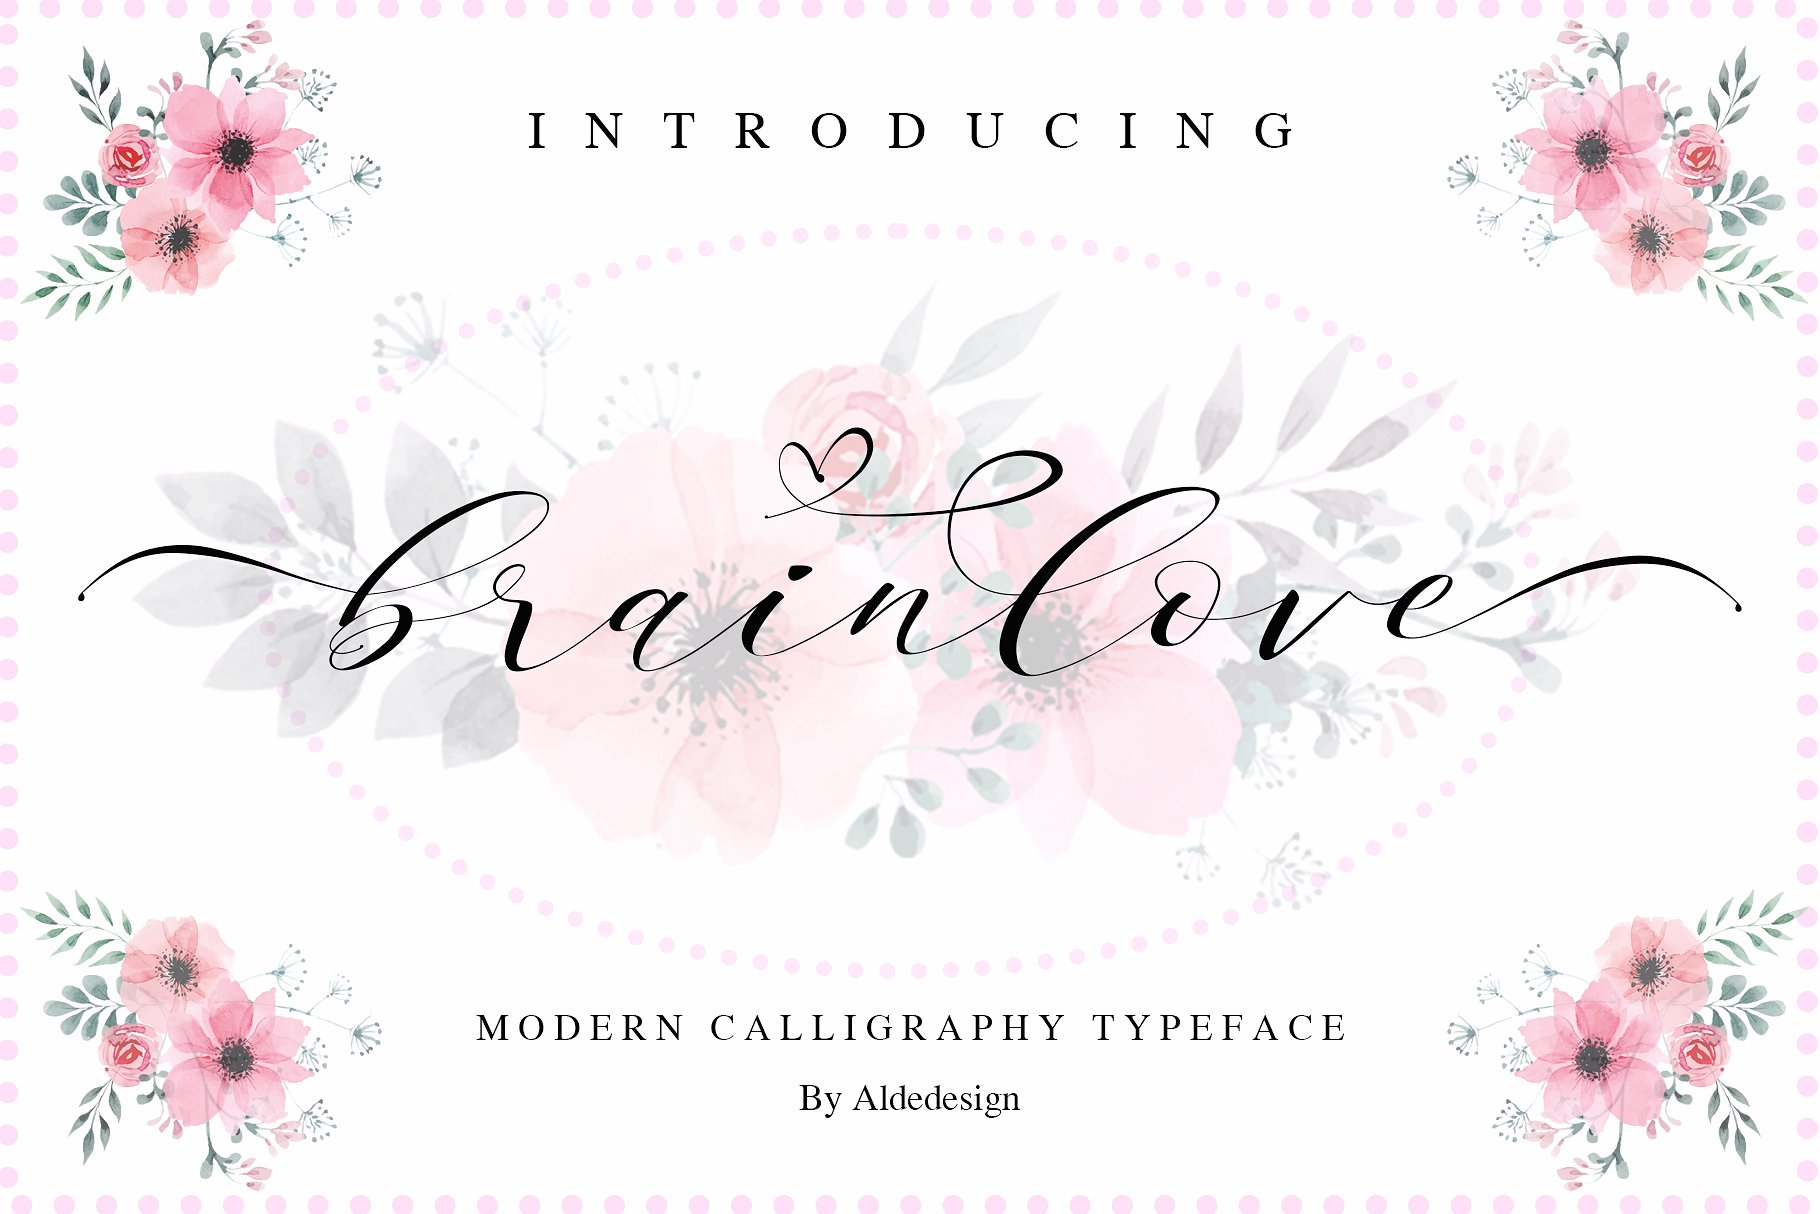 Brainlove Calligraphy